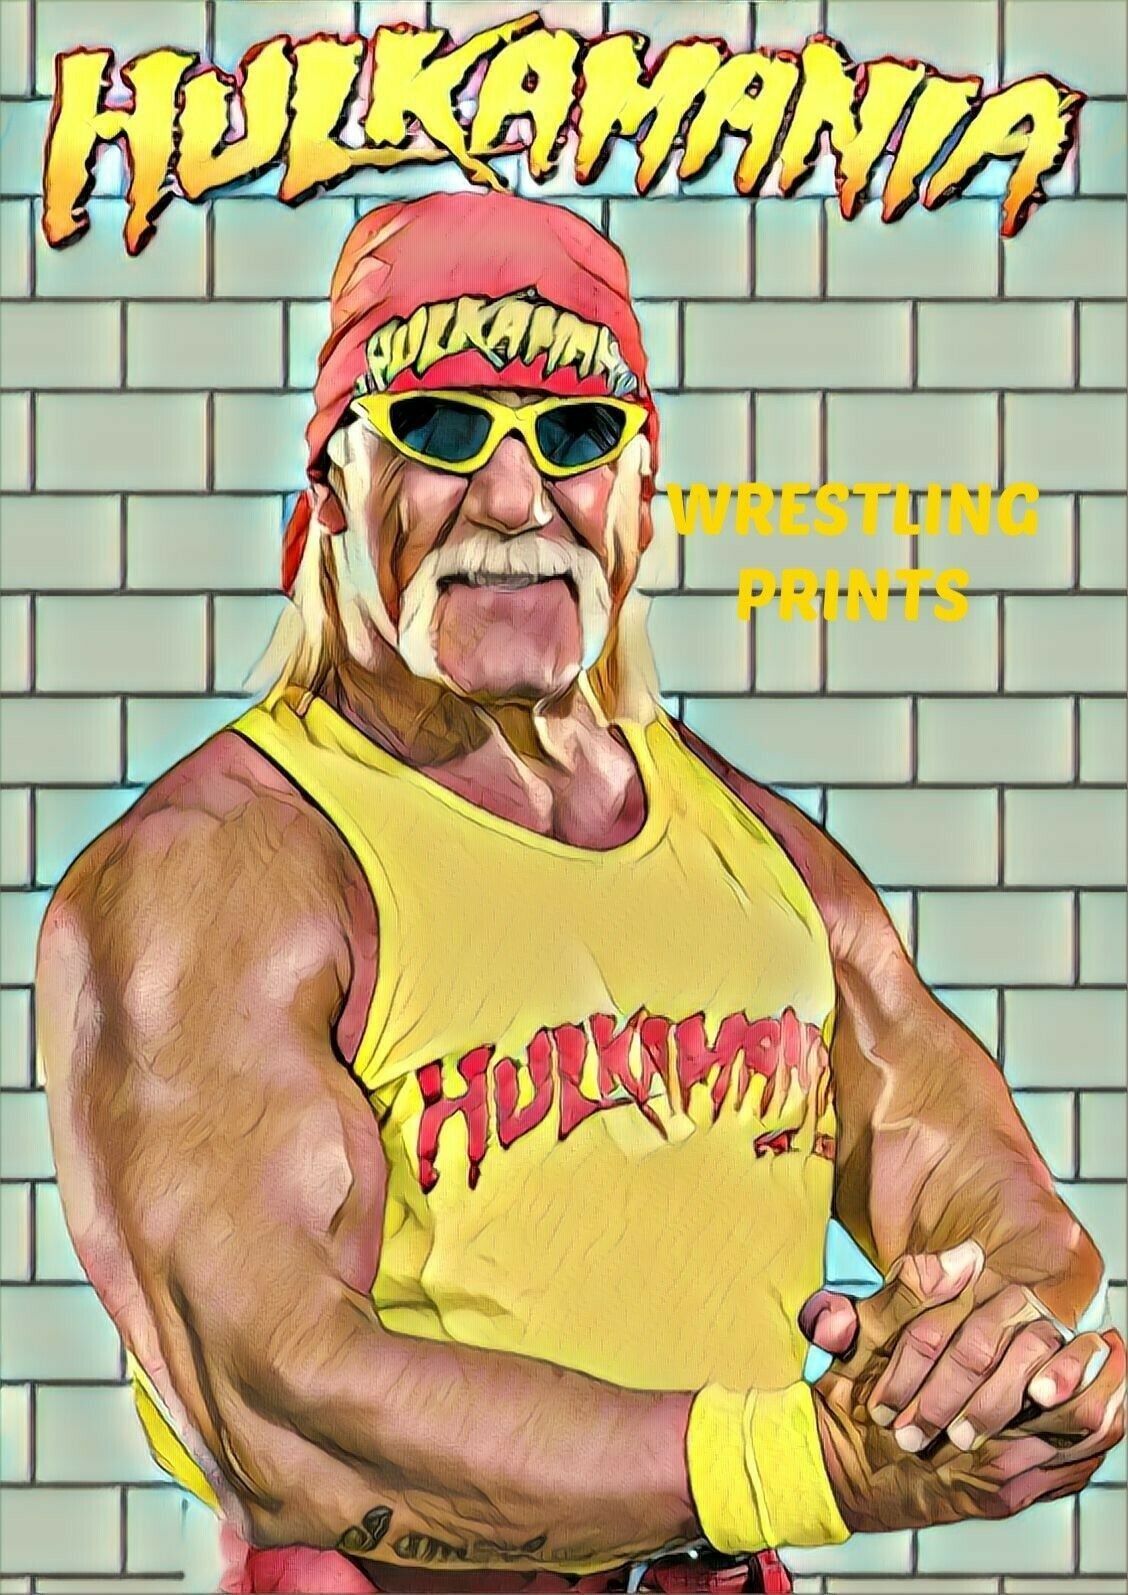 WWF WWE WRESTLEMANIA 1 HULK HOGAN MR T A4 PRINT 230GSM RETRO POSTER WALL ART